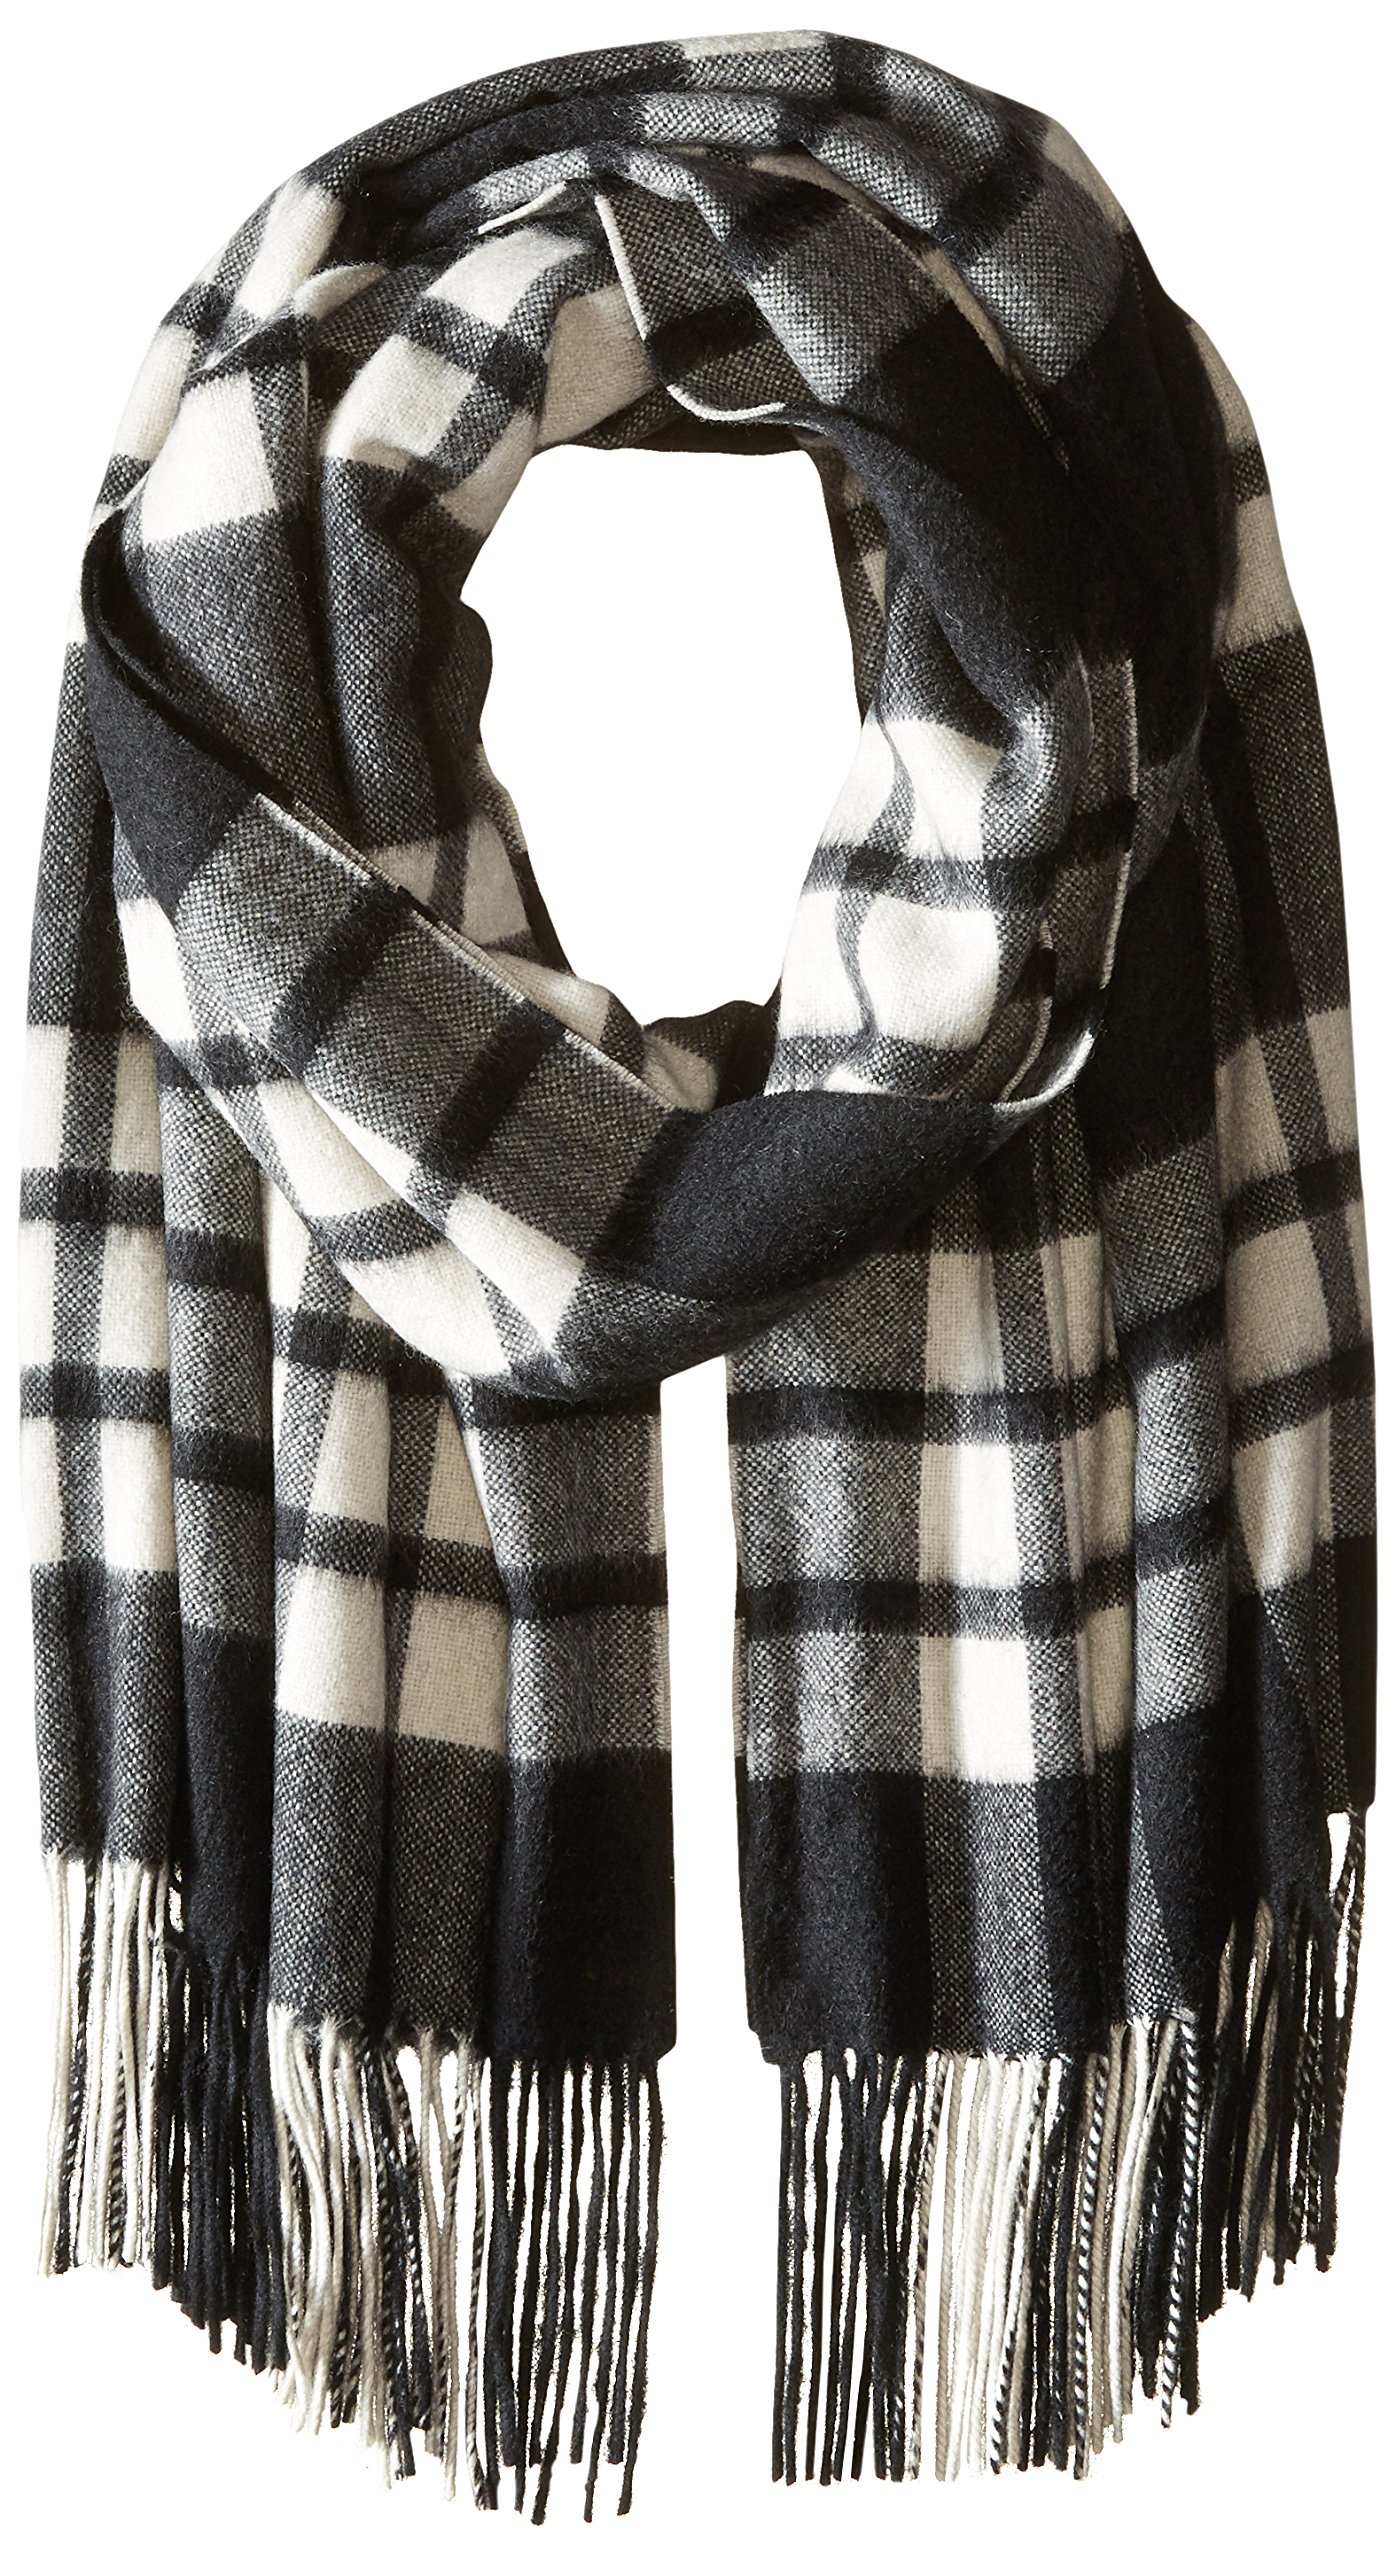 Phenix Cashmere Women's Plaid 100 Percent Cashmere Wrap, Black/White, One Size